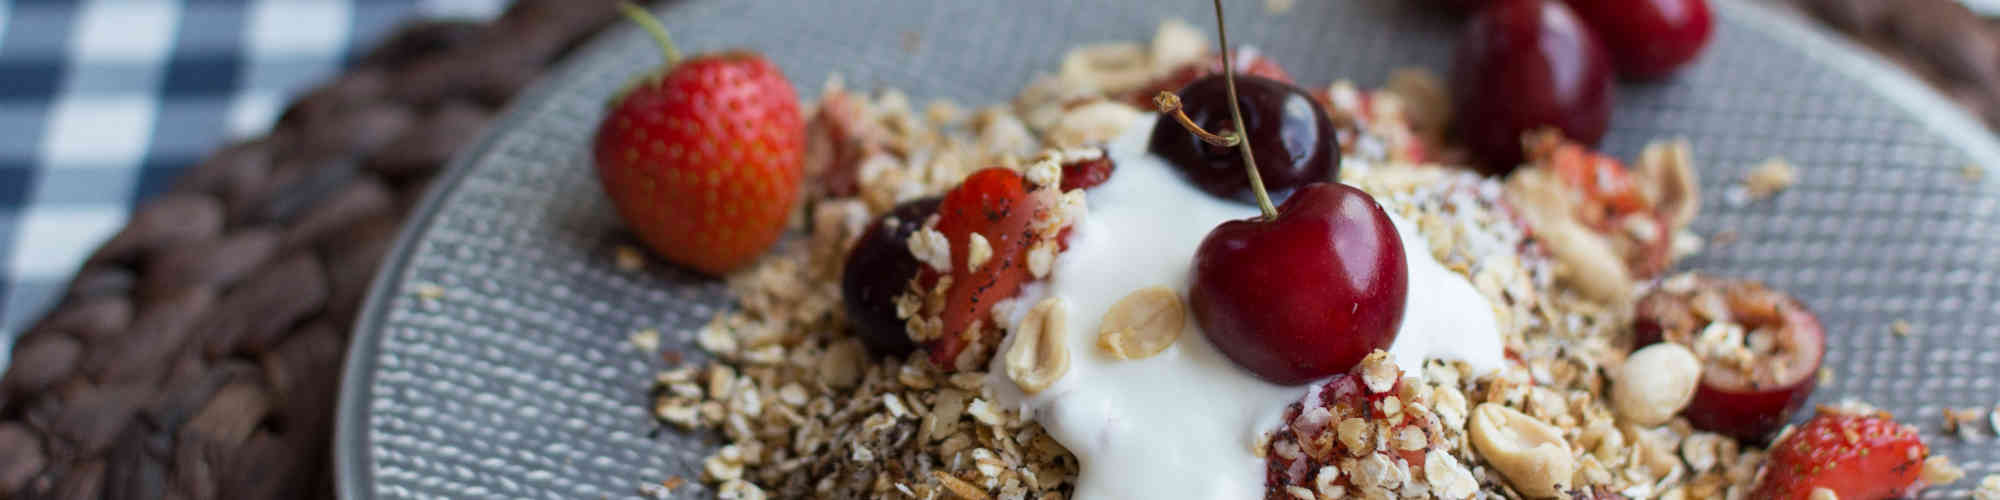 https://s3.amazonaws.com/ka-images-prod/mastheads/granola-with-cherries.jpg